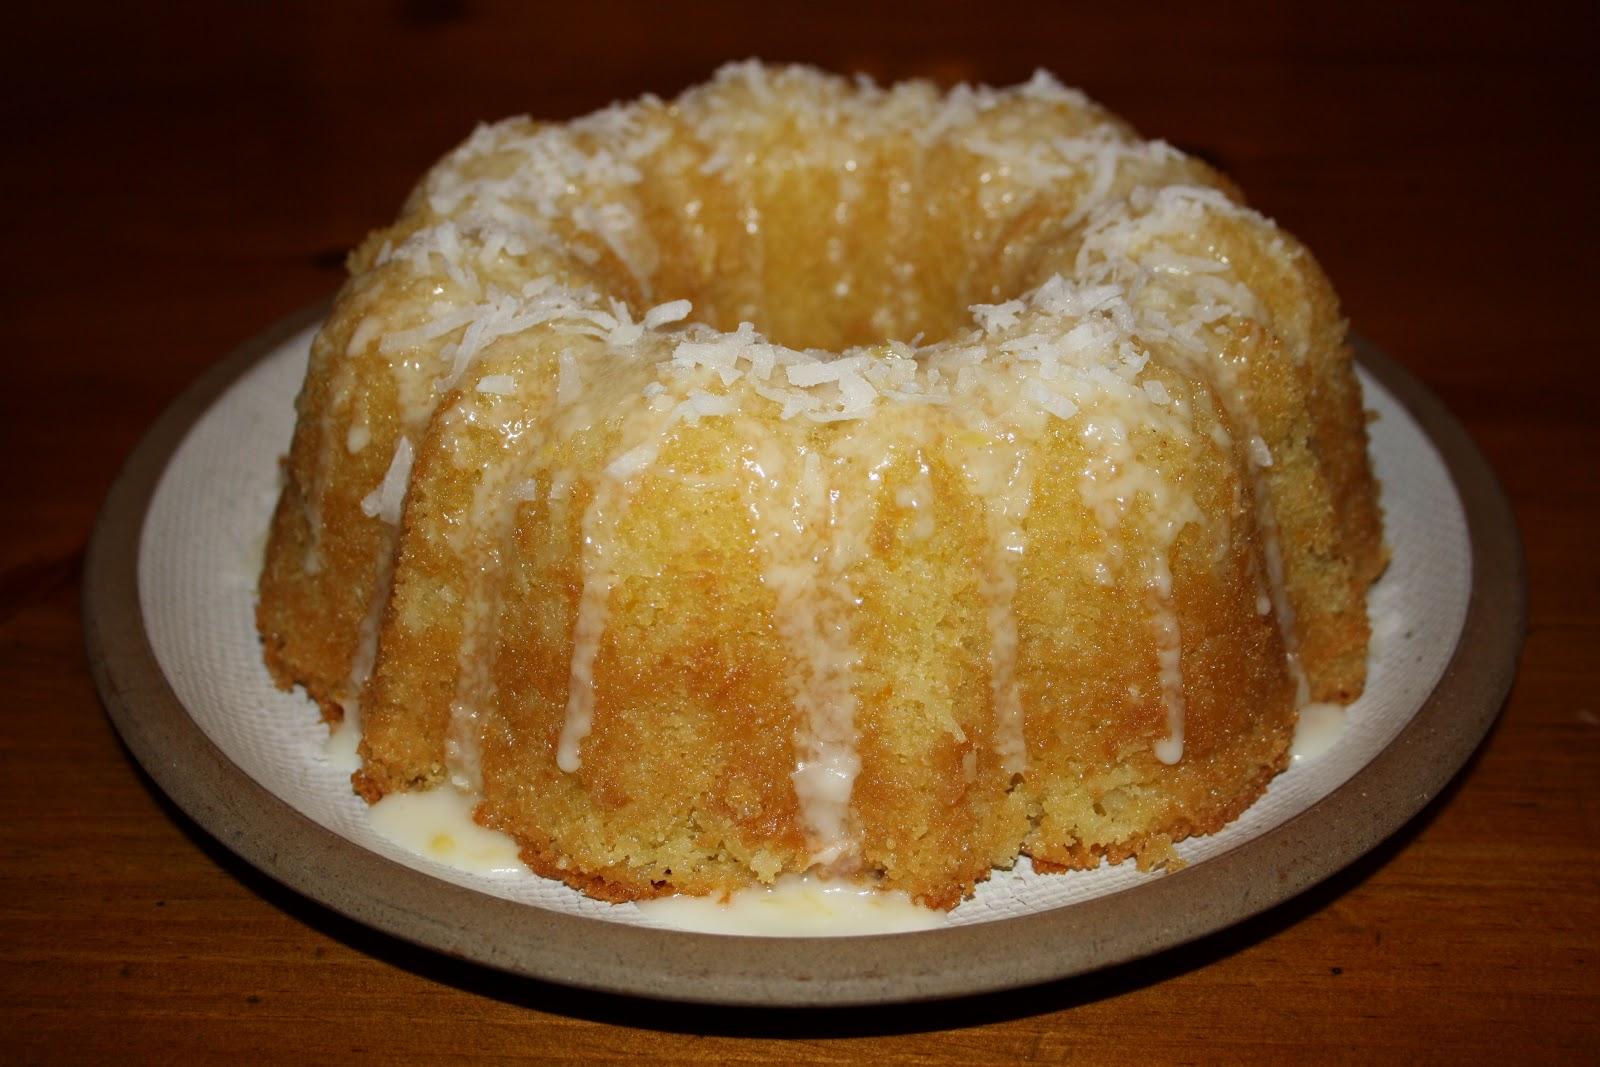 Food Fighters: Orange & Coconut Cake